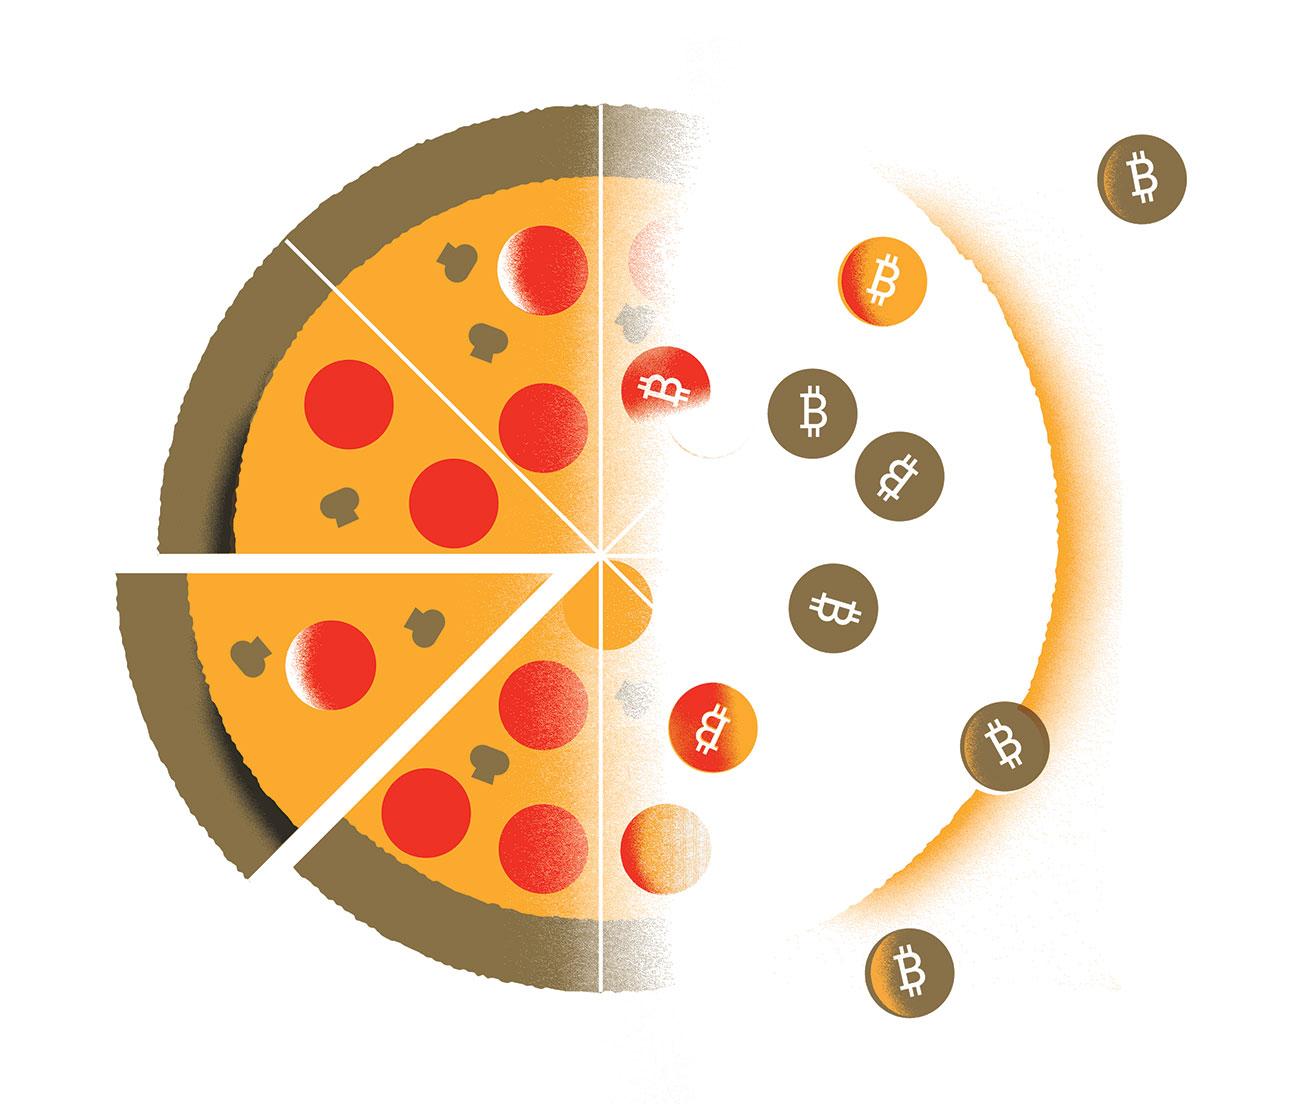 Bitcoins spread over a pizza